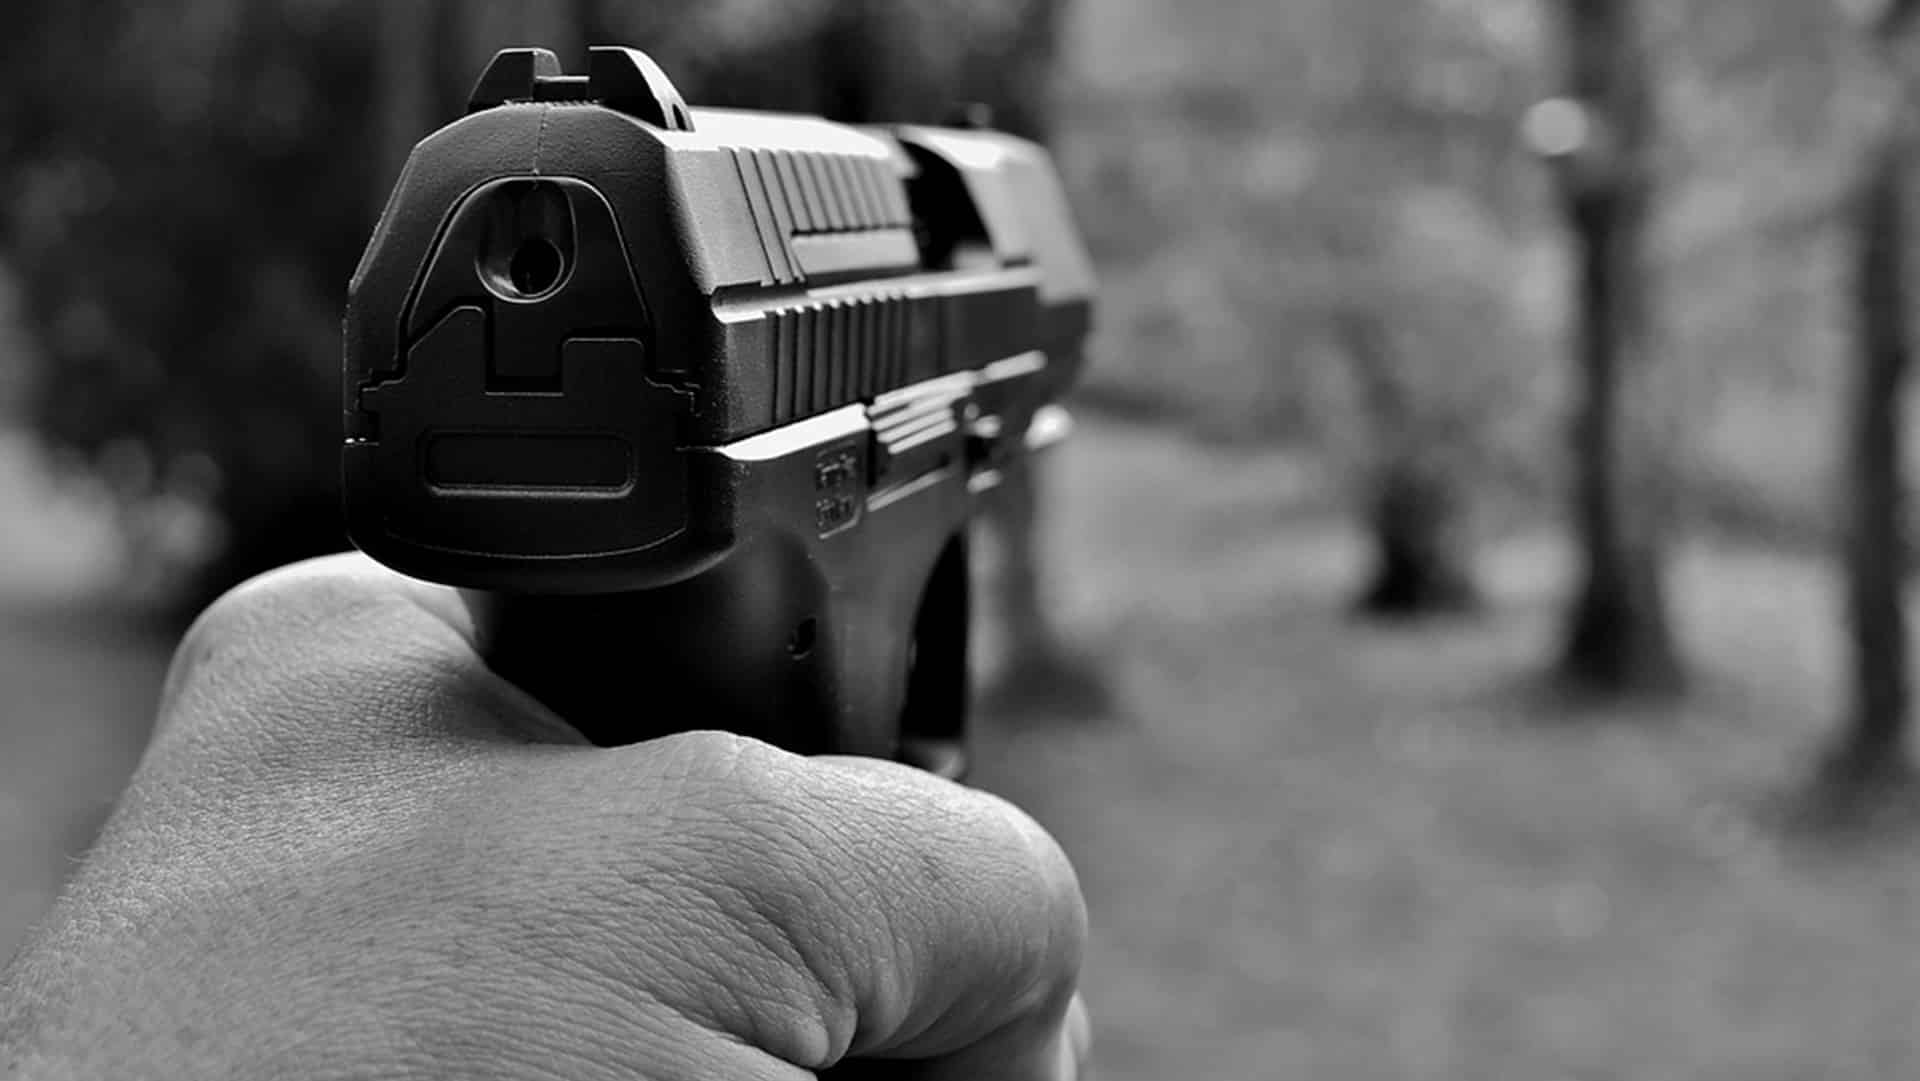 shootout at Delhi's Rohini court complex